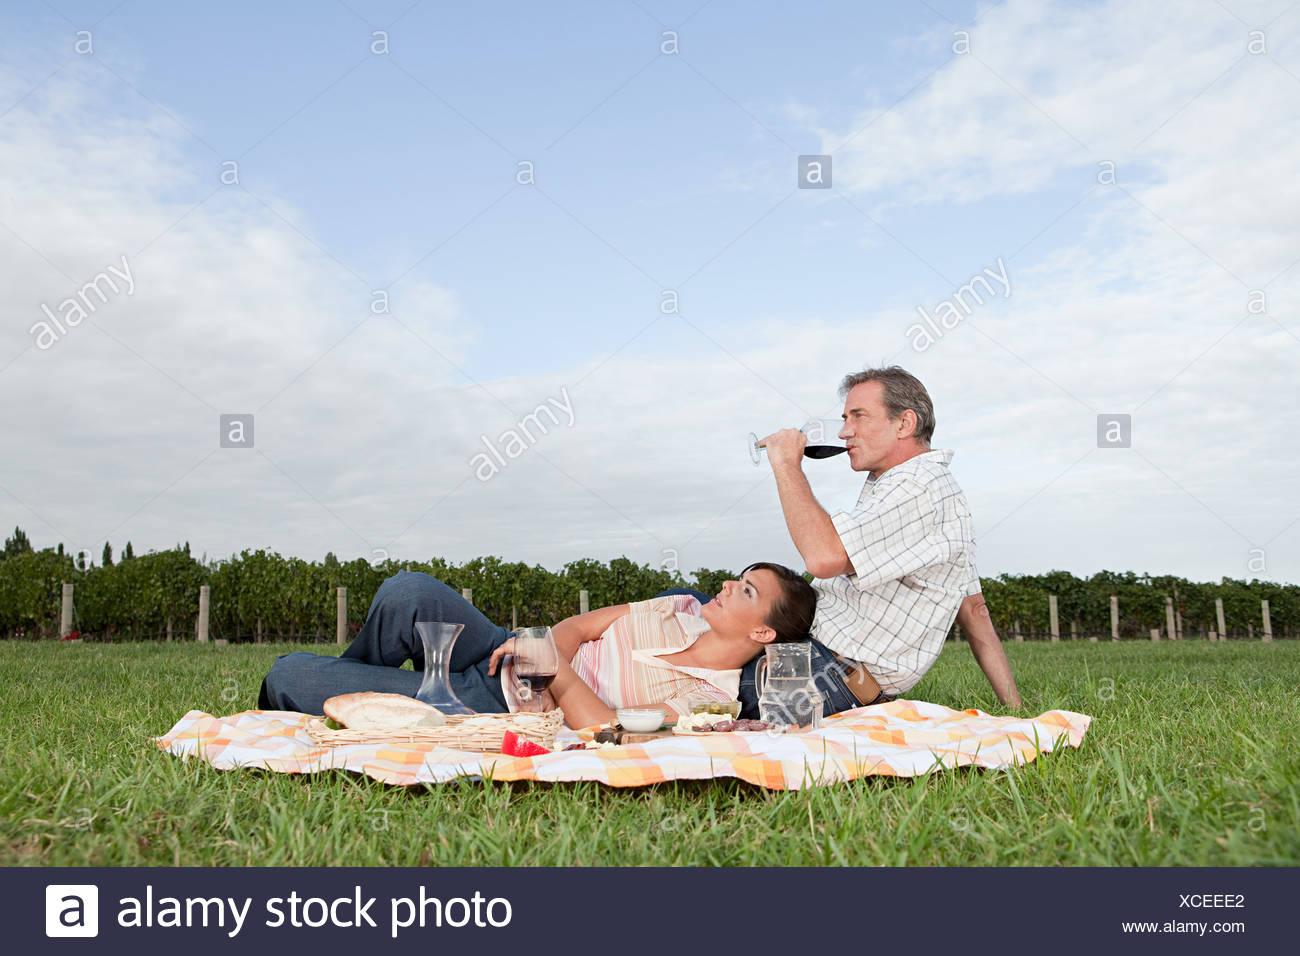 Couple Having Picnic In Vineyard   Stock Image